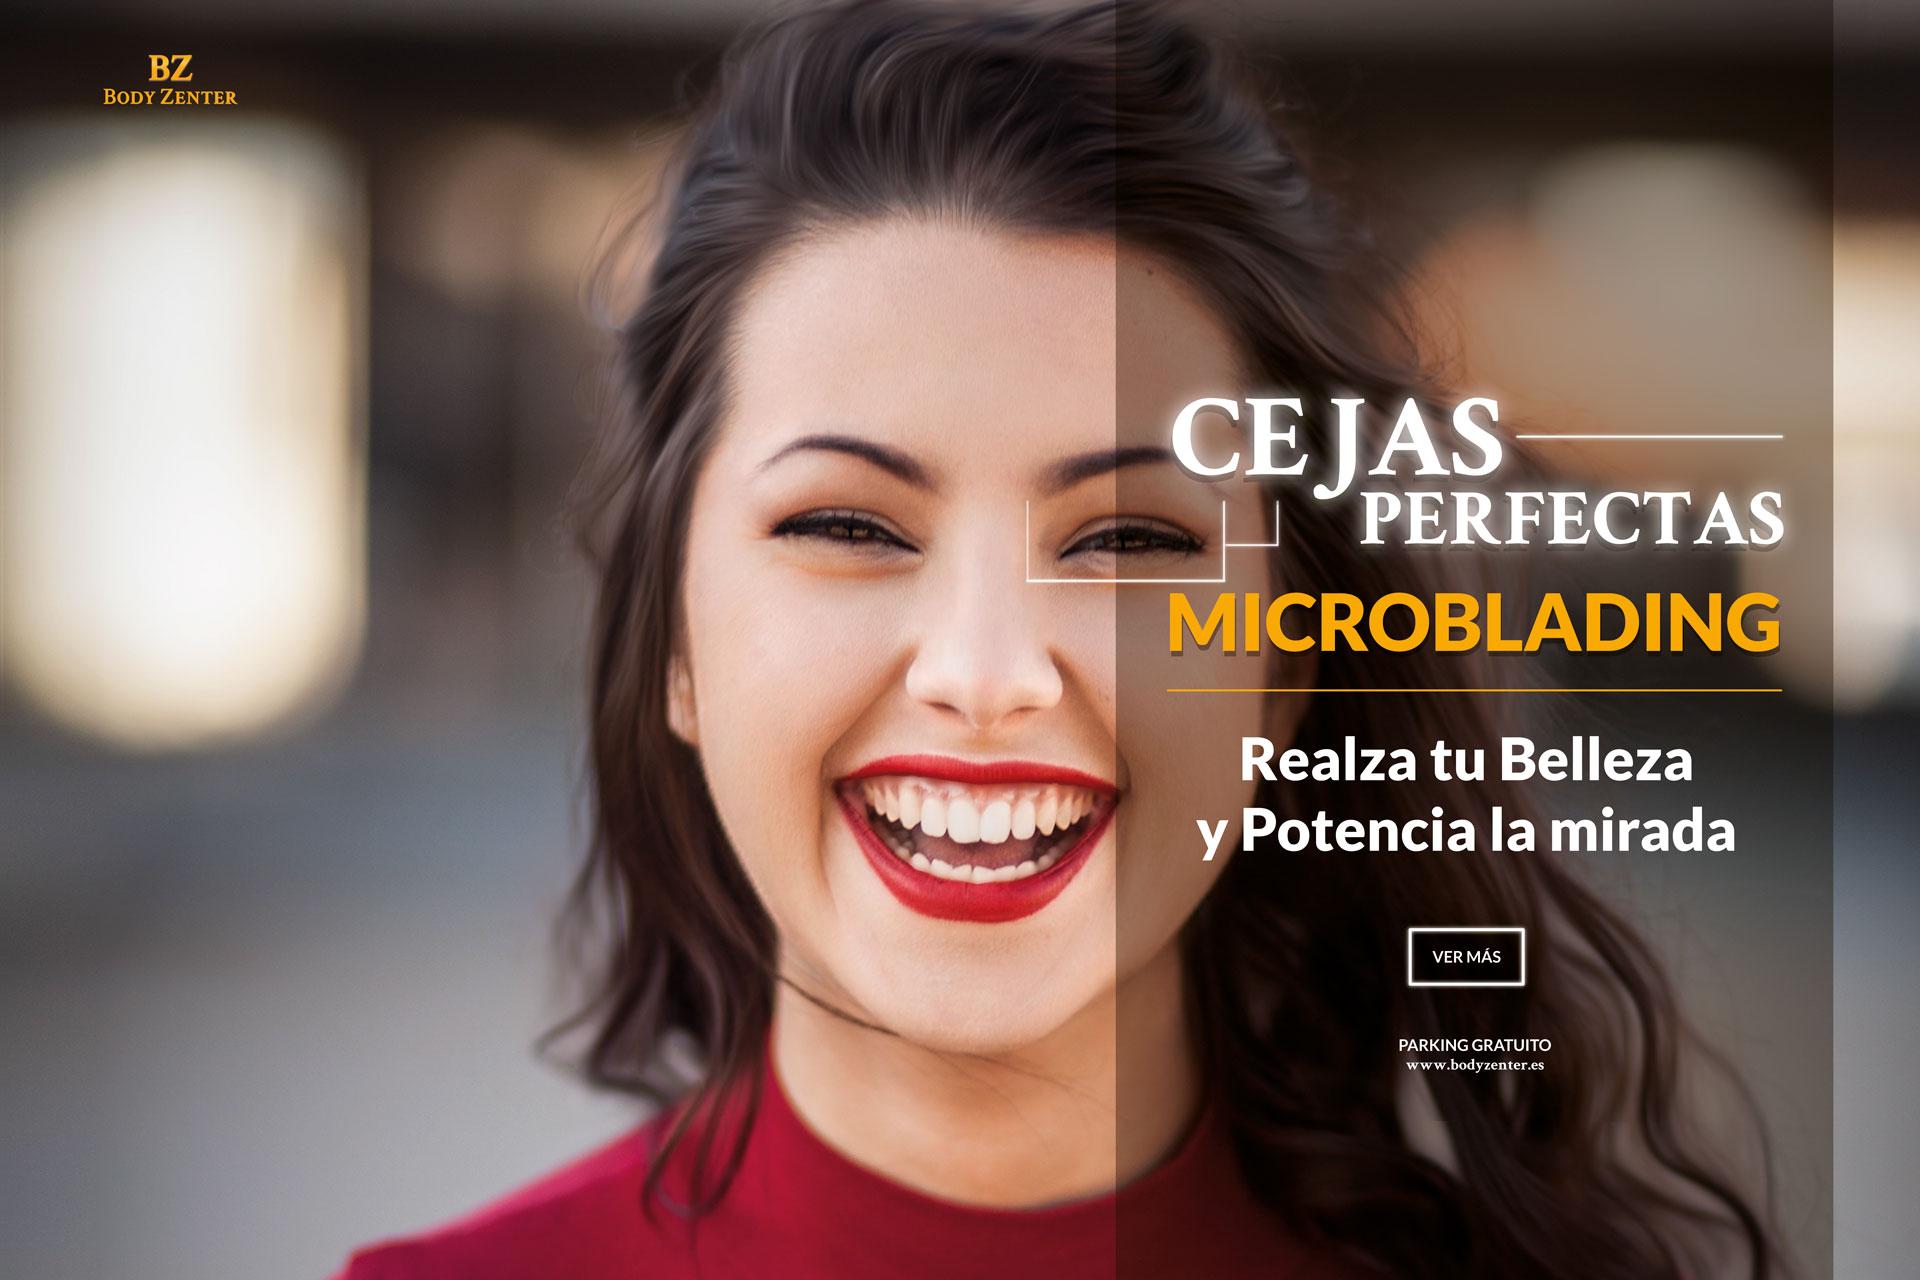 microblading-centros-pelo-a-pelo-relleno-cejas-retoque-rectificar-micropigmentación-tatuajes Elche